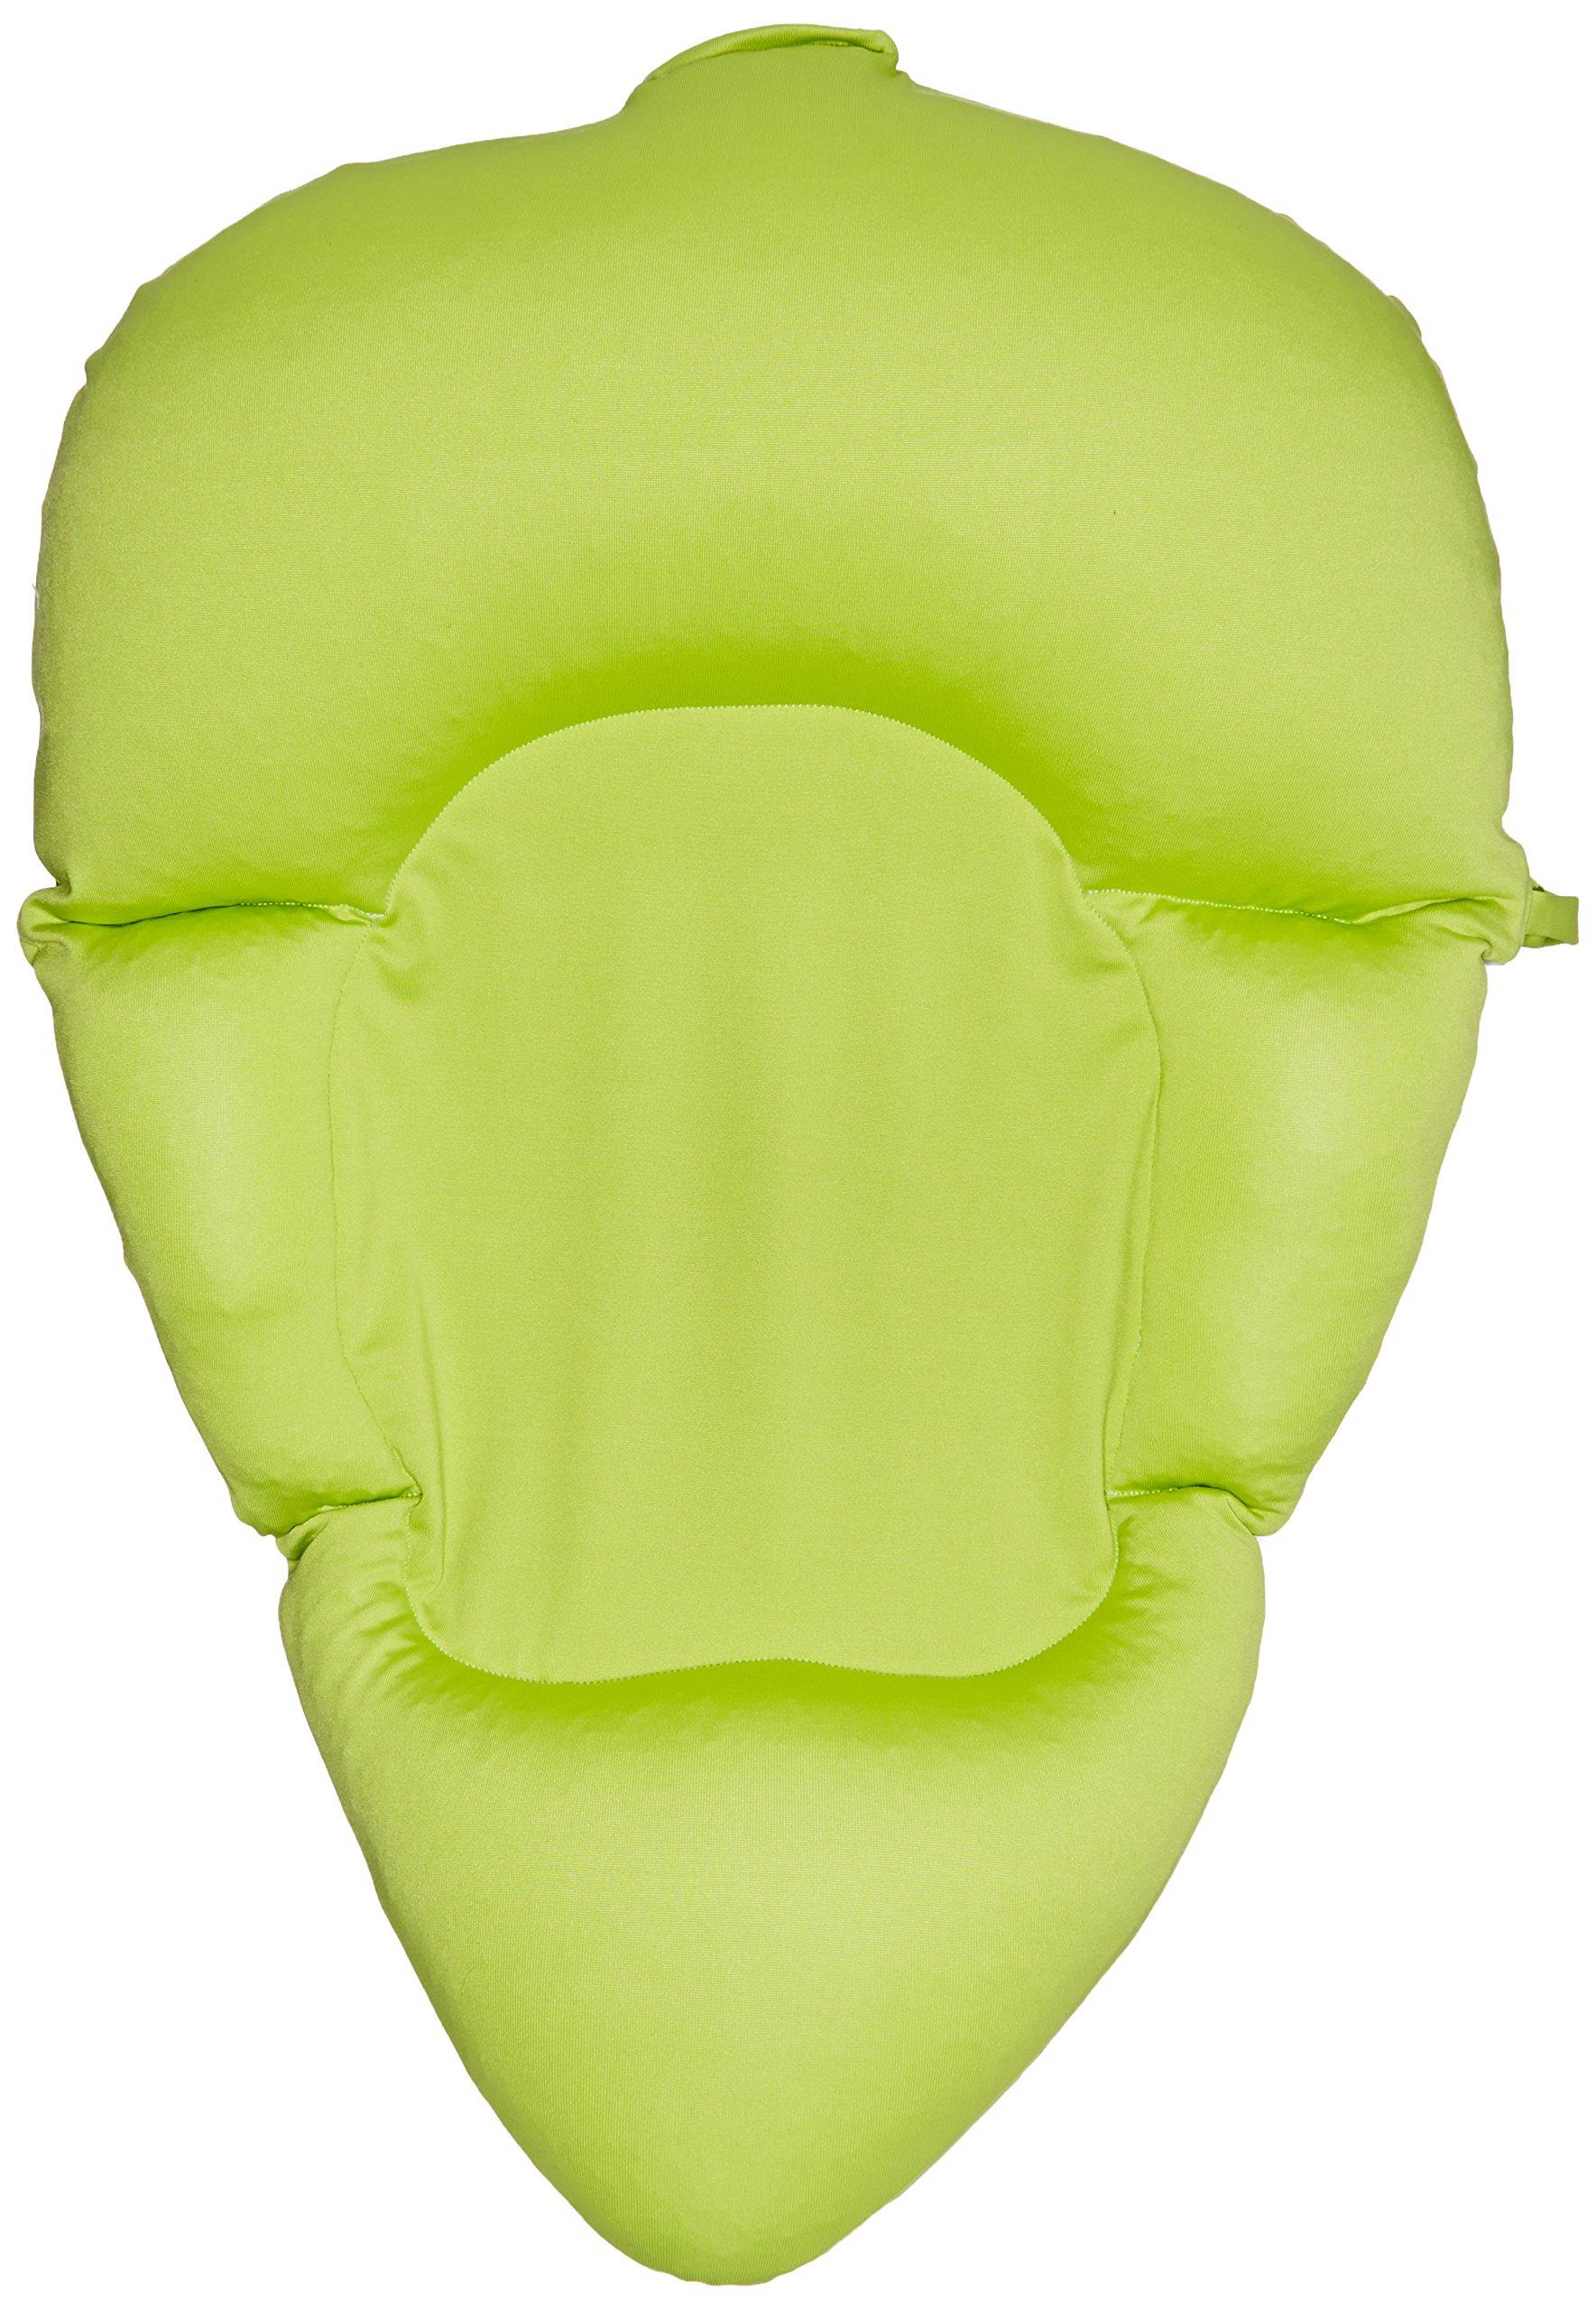 Shibaba Cushioned Baby Toddler Bath Tub Seat, Green 2